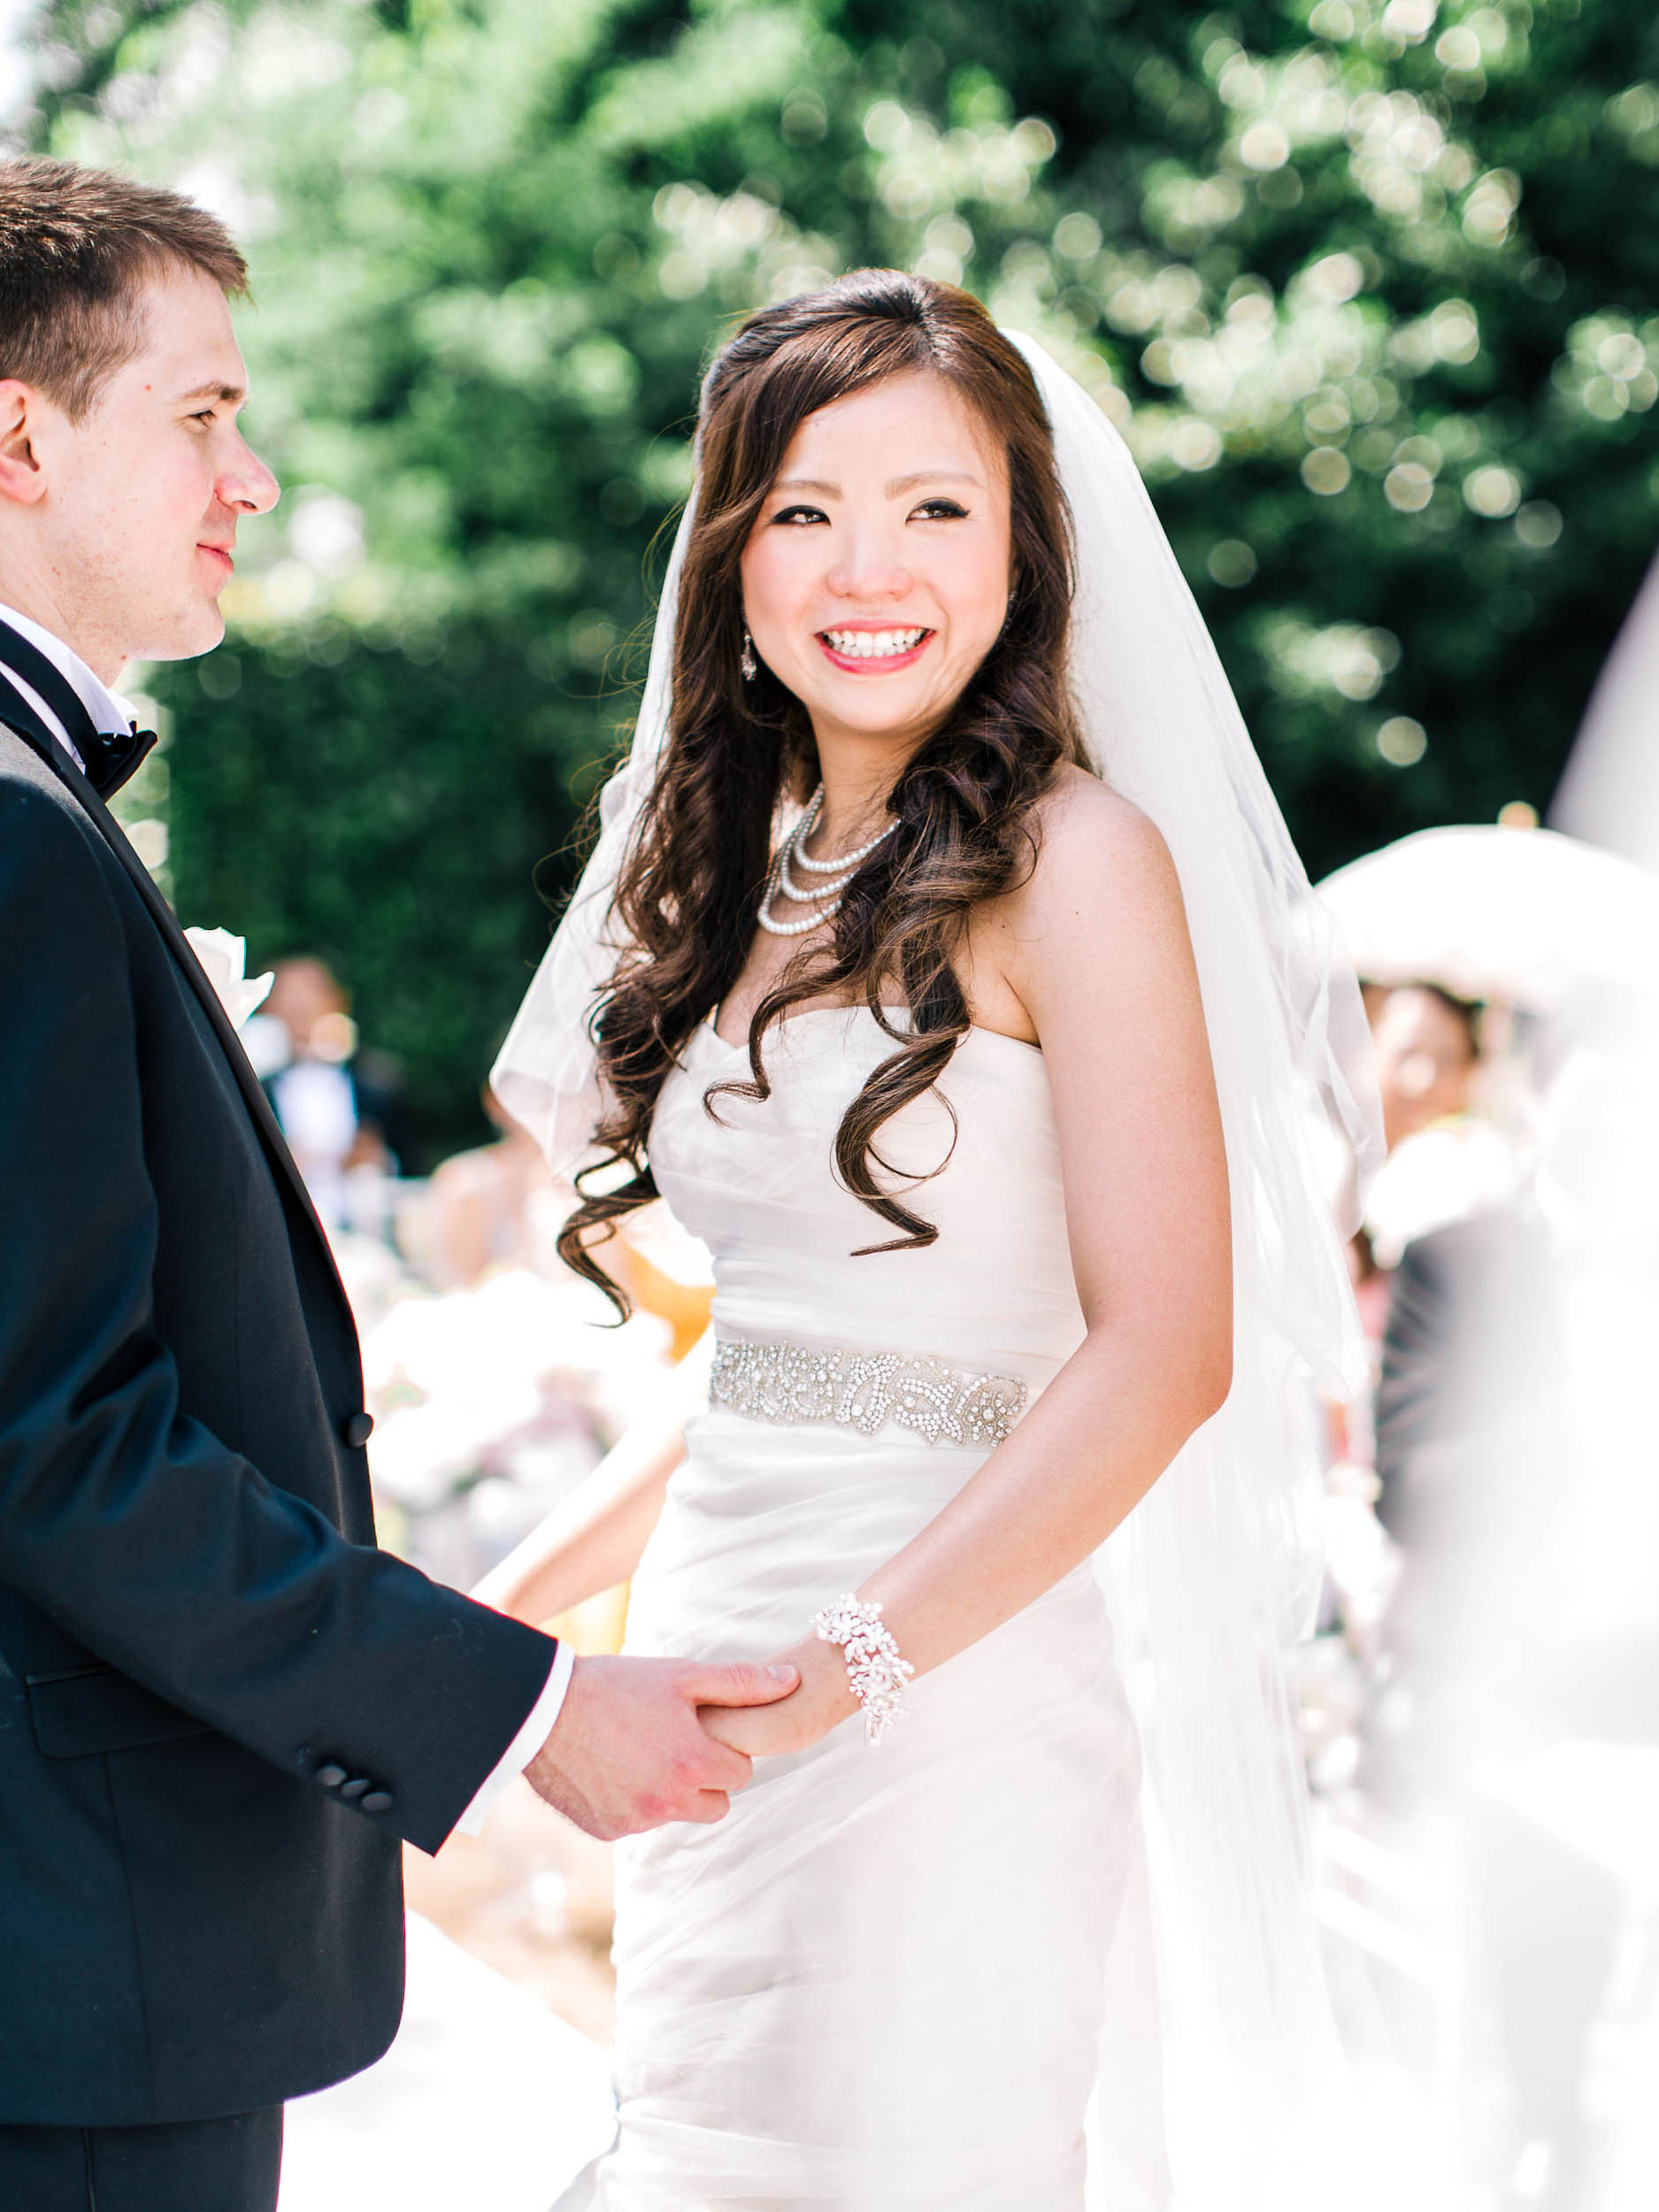 Amy O'Boyle Photography- Destination & UK Fine Art Film Wedding Photographer- Chateau La Durantie Wedding-100.jpg